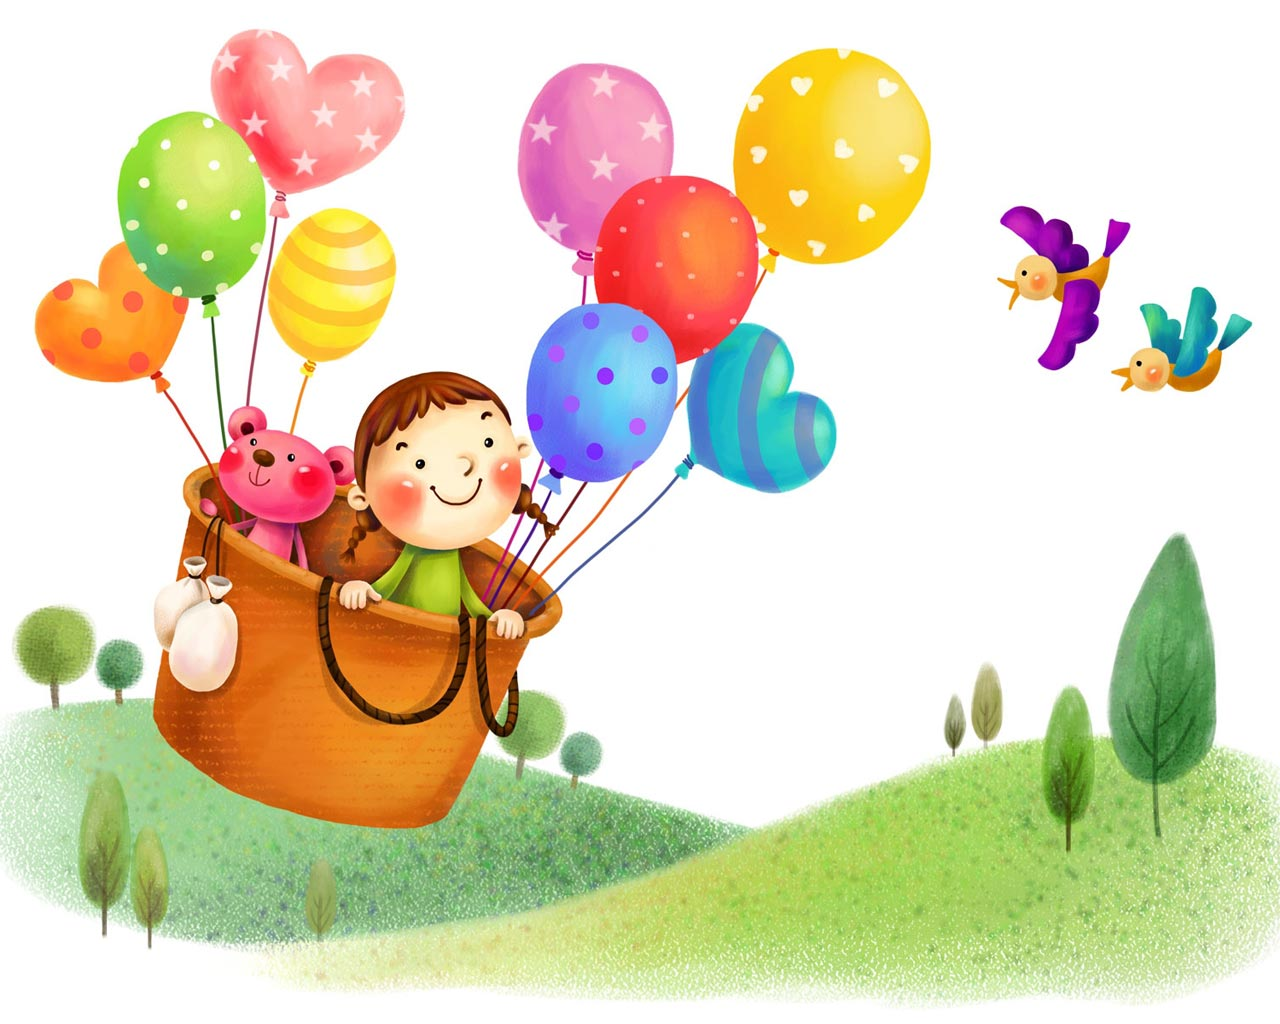 Fondos de diapositivas animadas para niños - Imagui